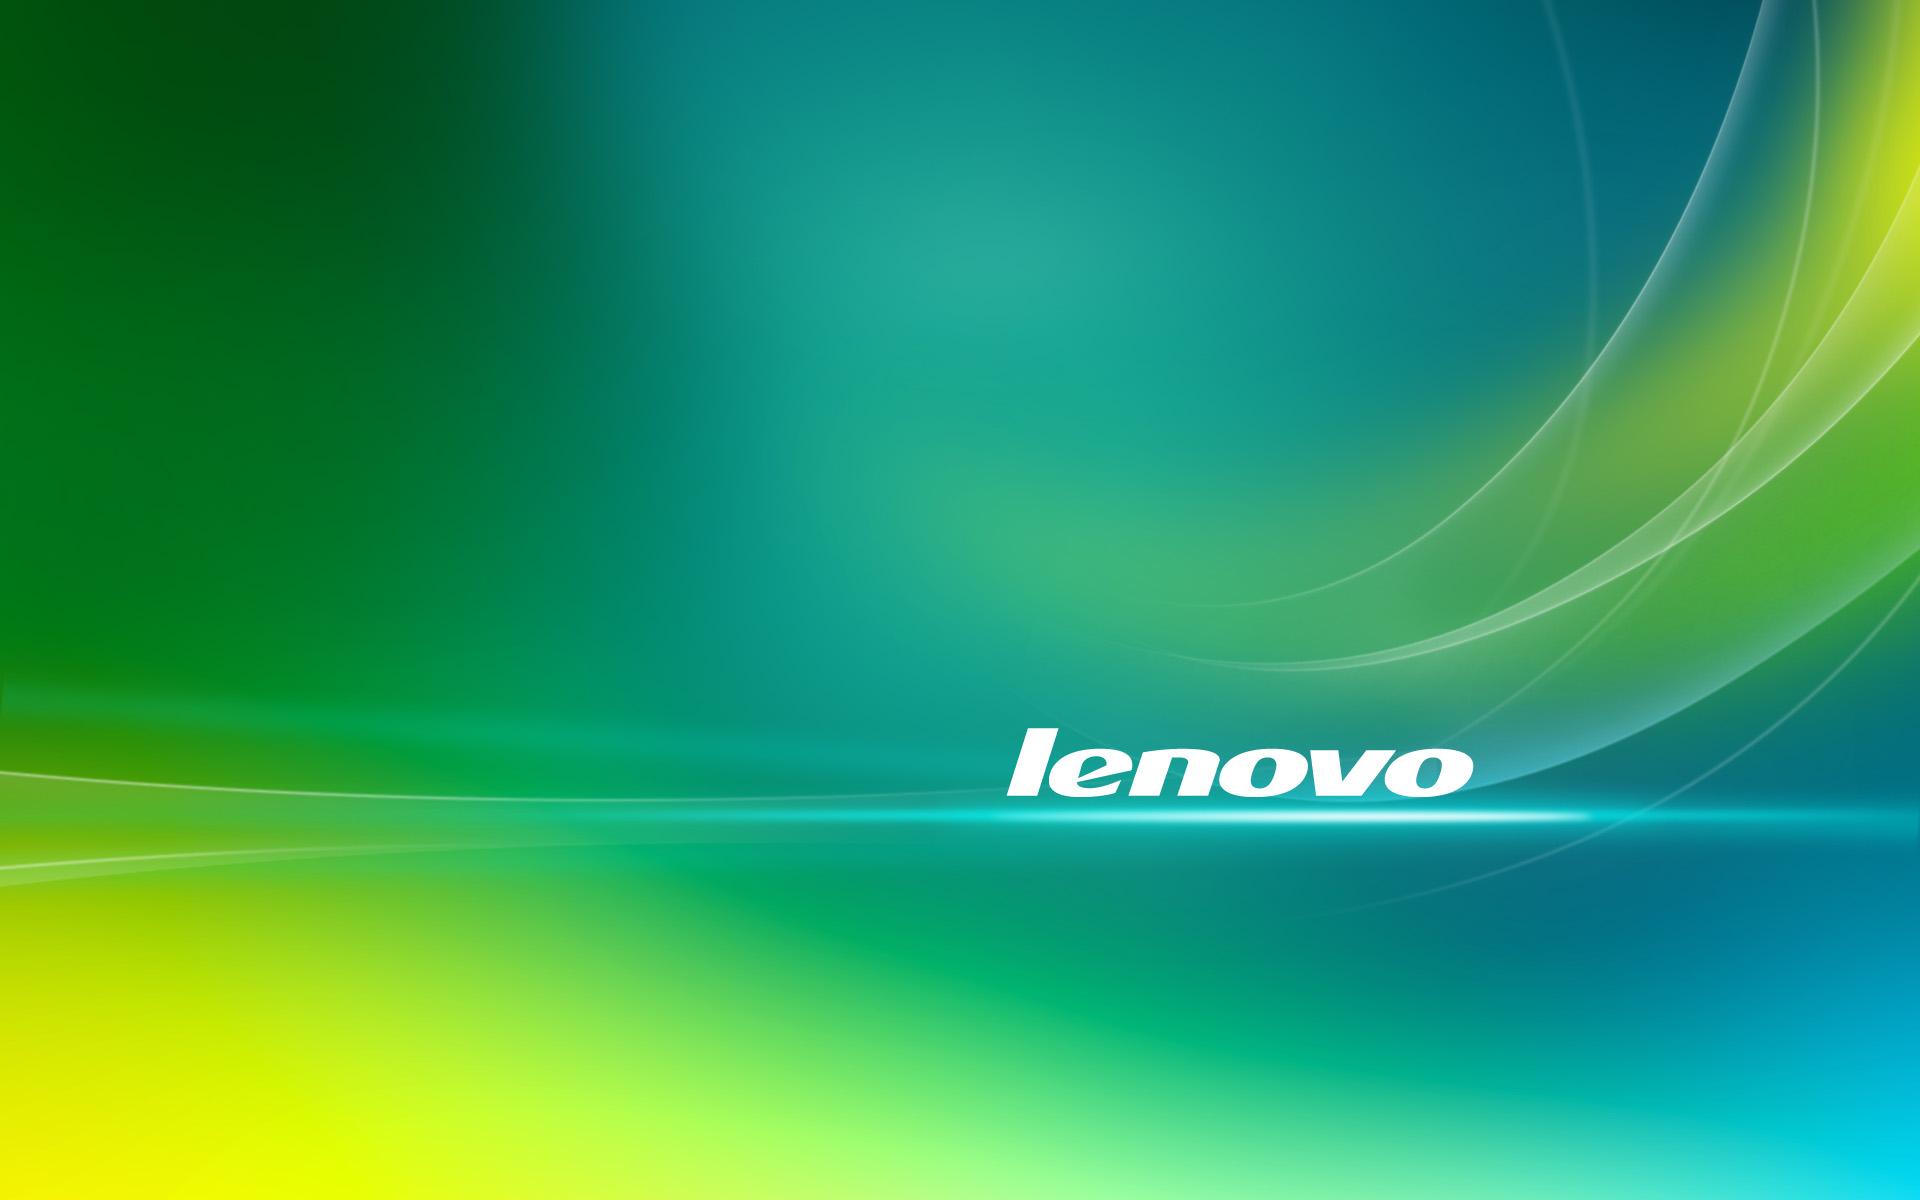 49+] Lenovo Wallpaper Theme on WallpaperSafari